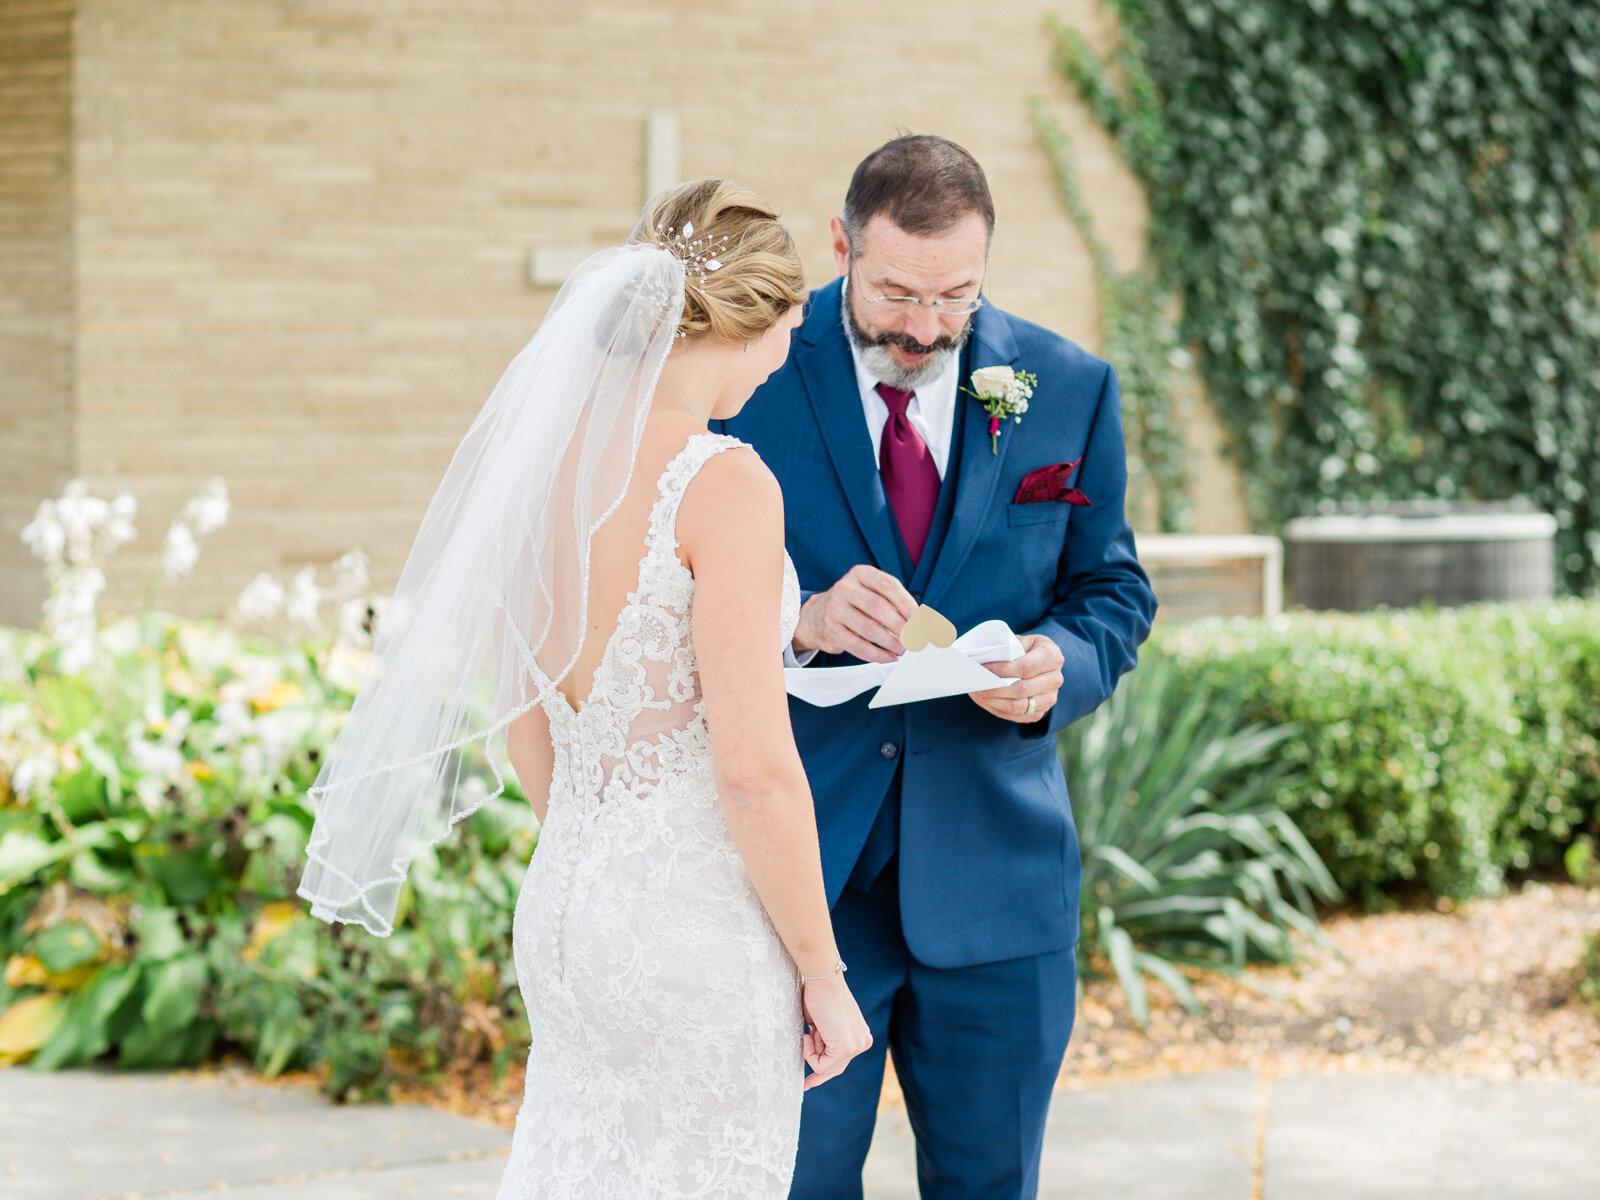 Elegant and Joyful Wedding at Crago Farms in Columbus, Ohio-17.jpg